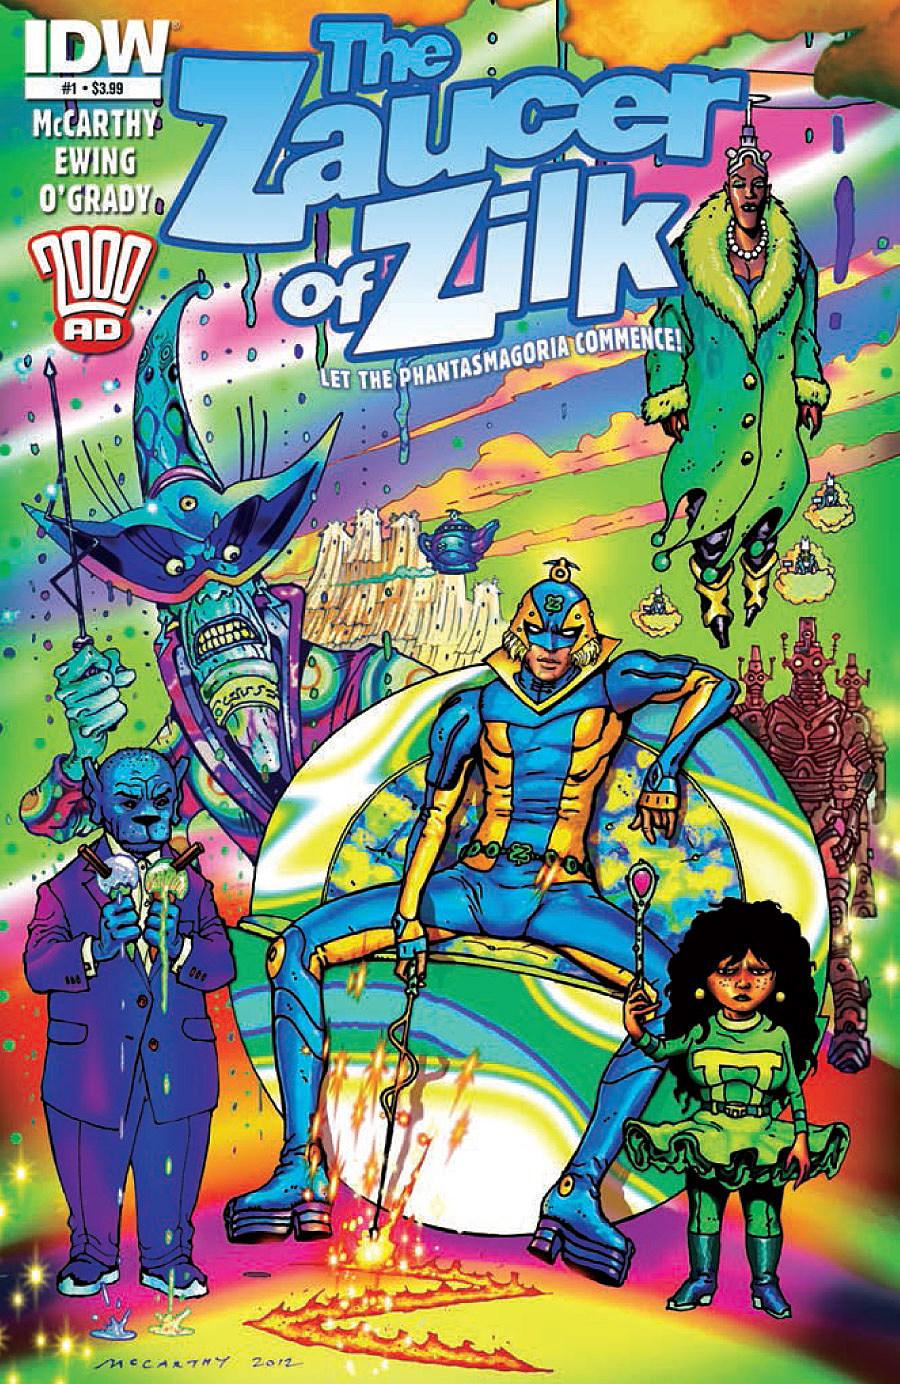 Image result for Zaucer of Zilk